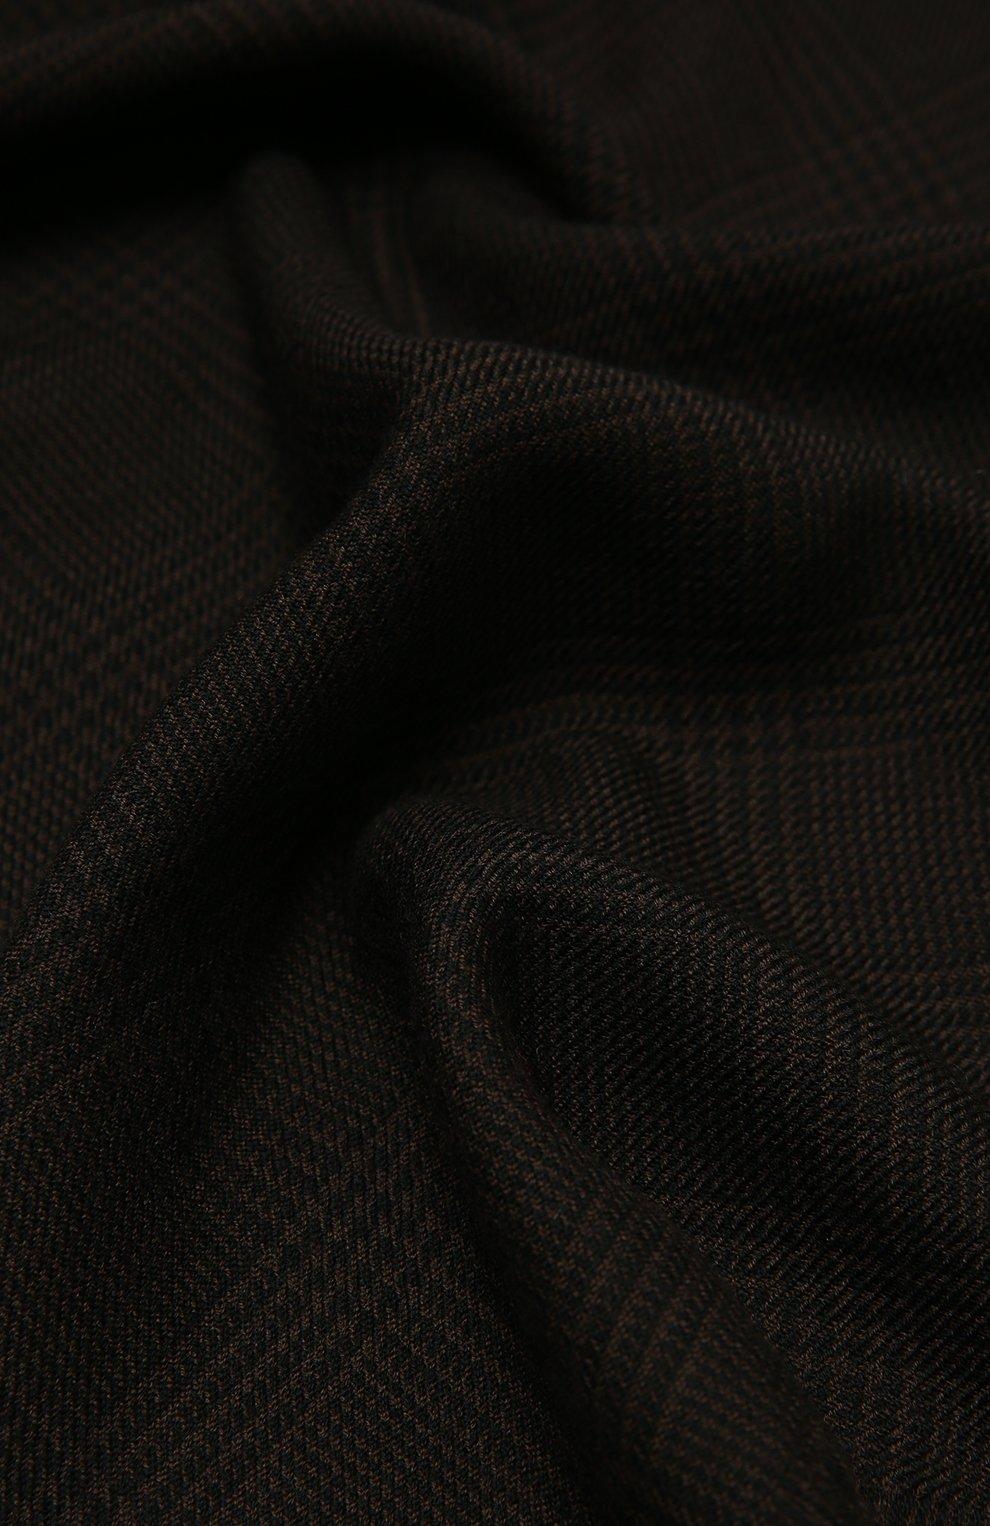 Мужской шерстяной шарф TOM FORD темно-коричневого цвета, арт. 8TF135/2BL | Фото 2